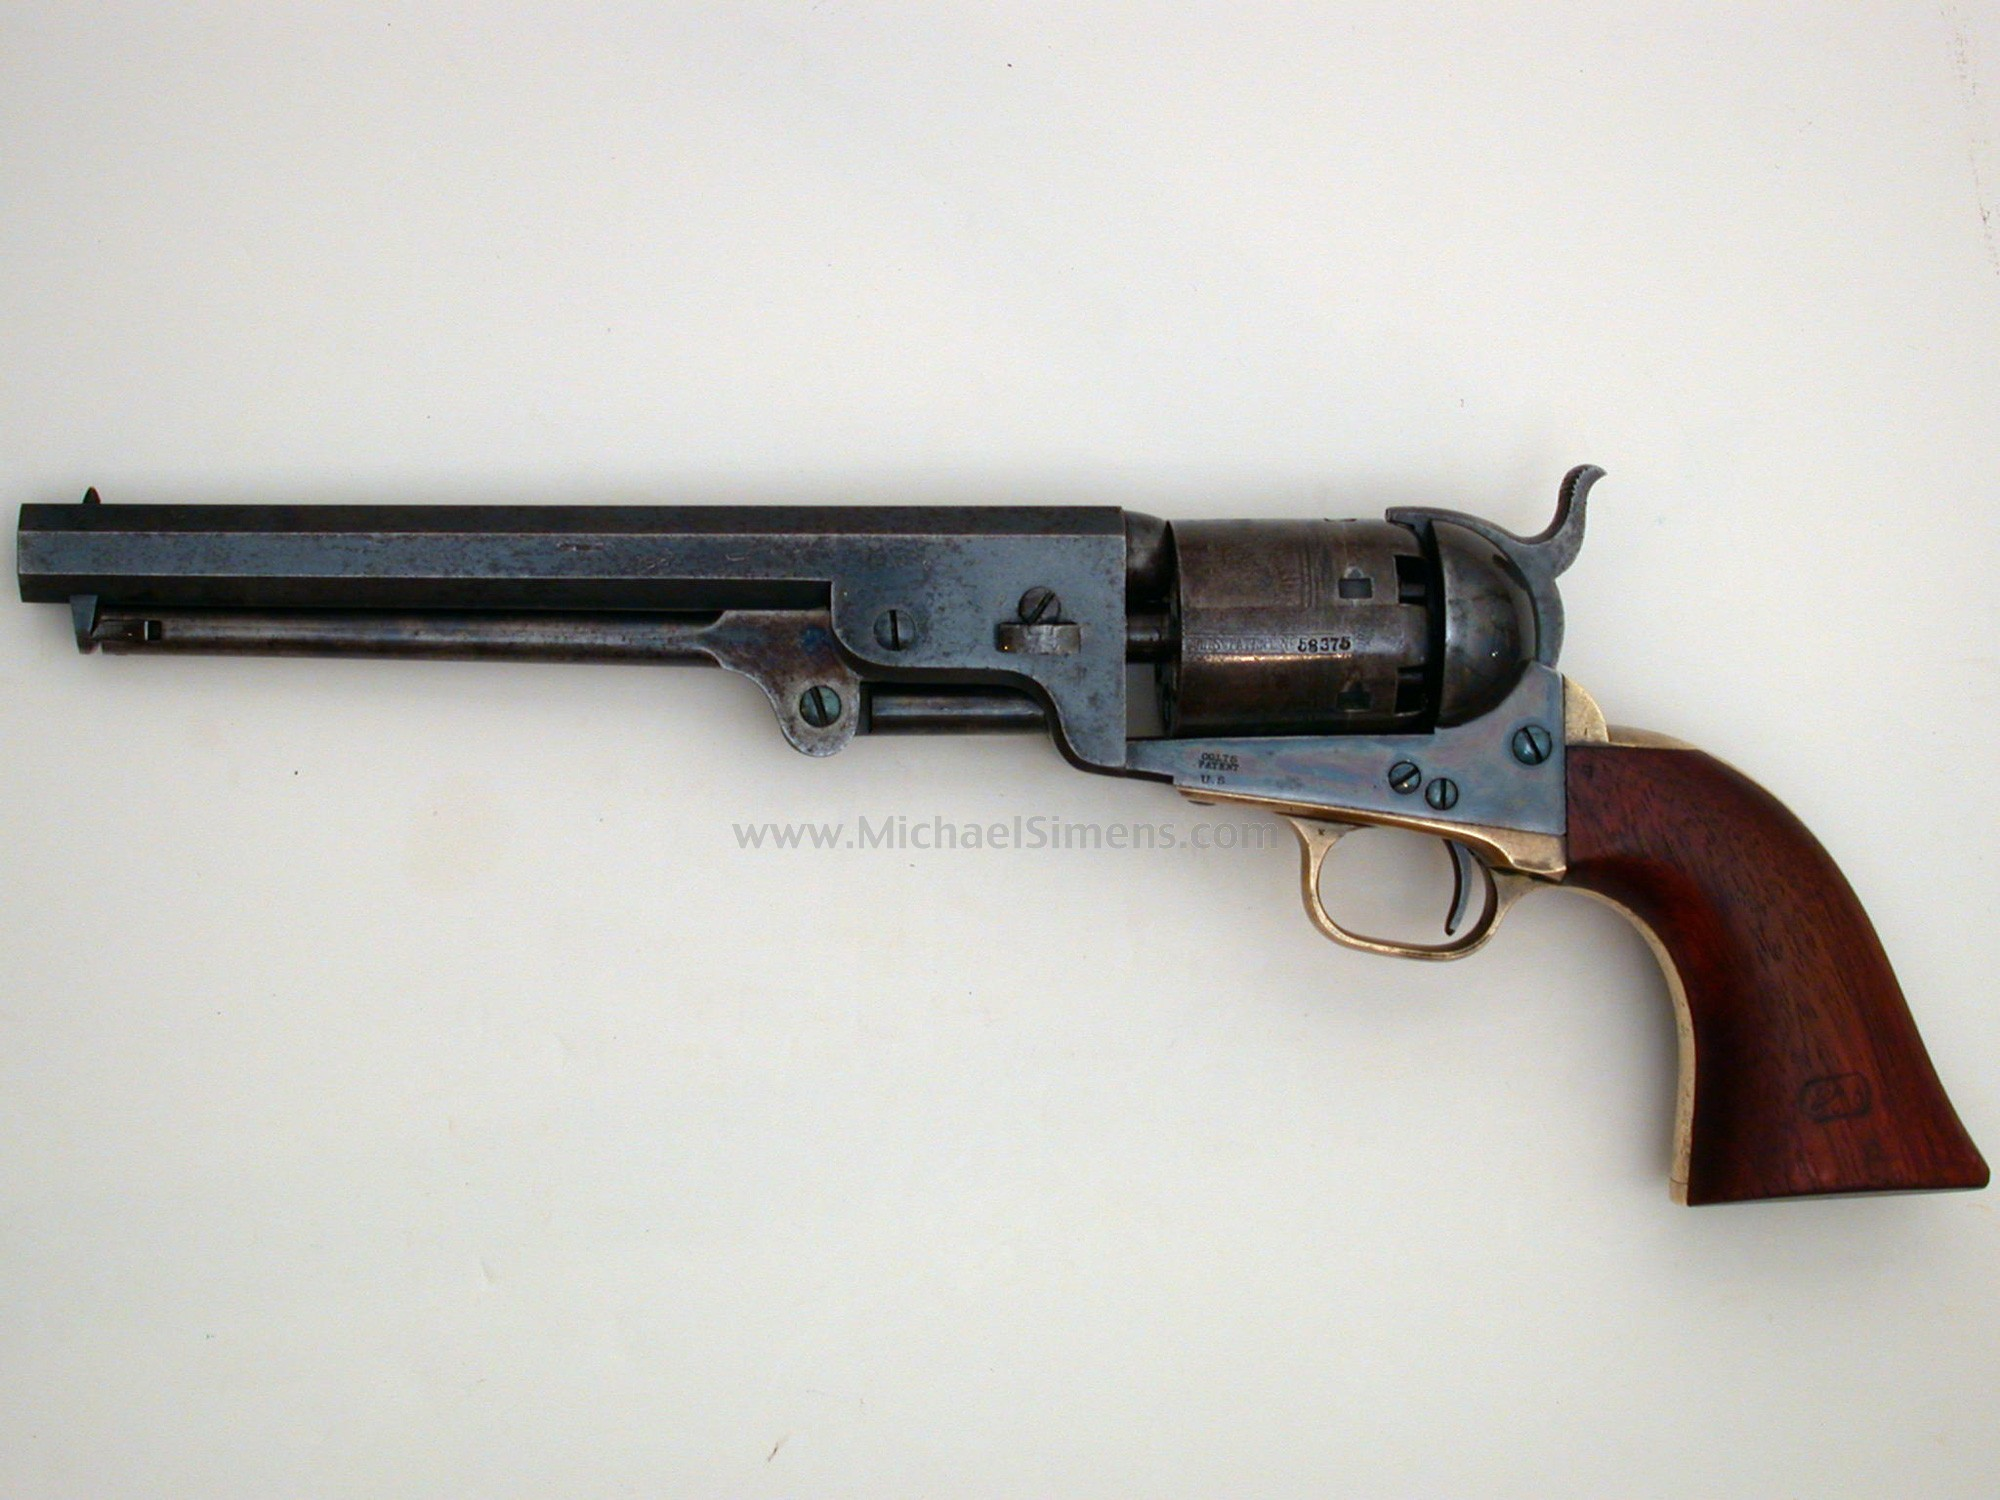 MARTIALLY MARKED COLT 1851 NAVY REVOLVER - Antique Colt Appraiser